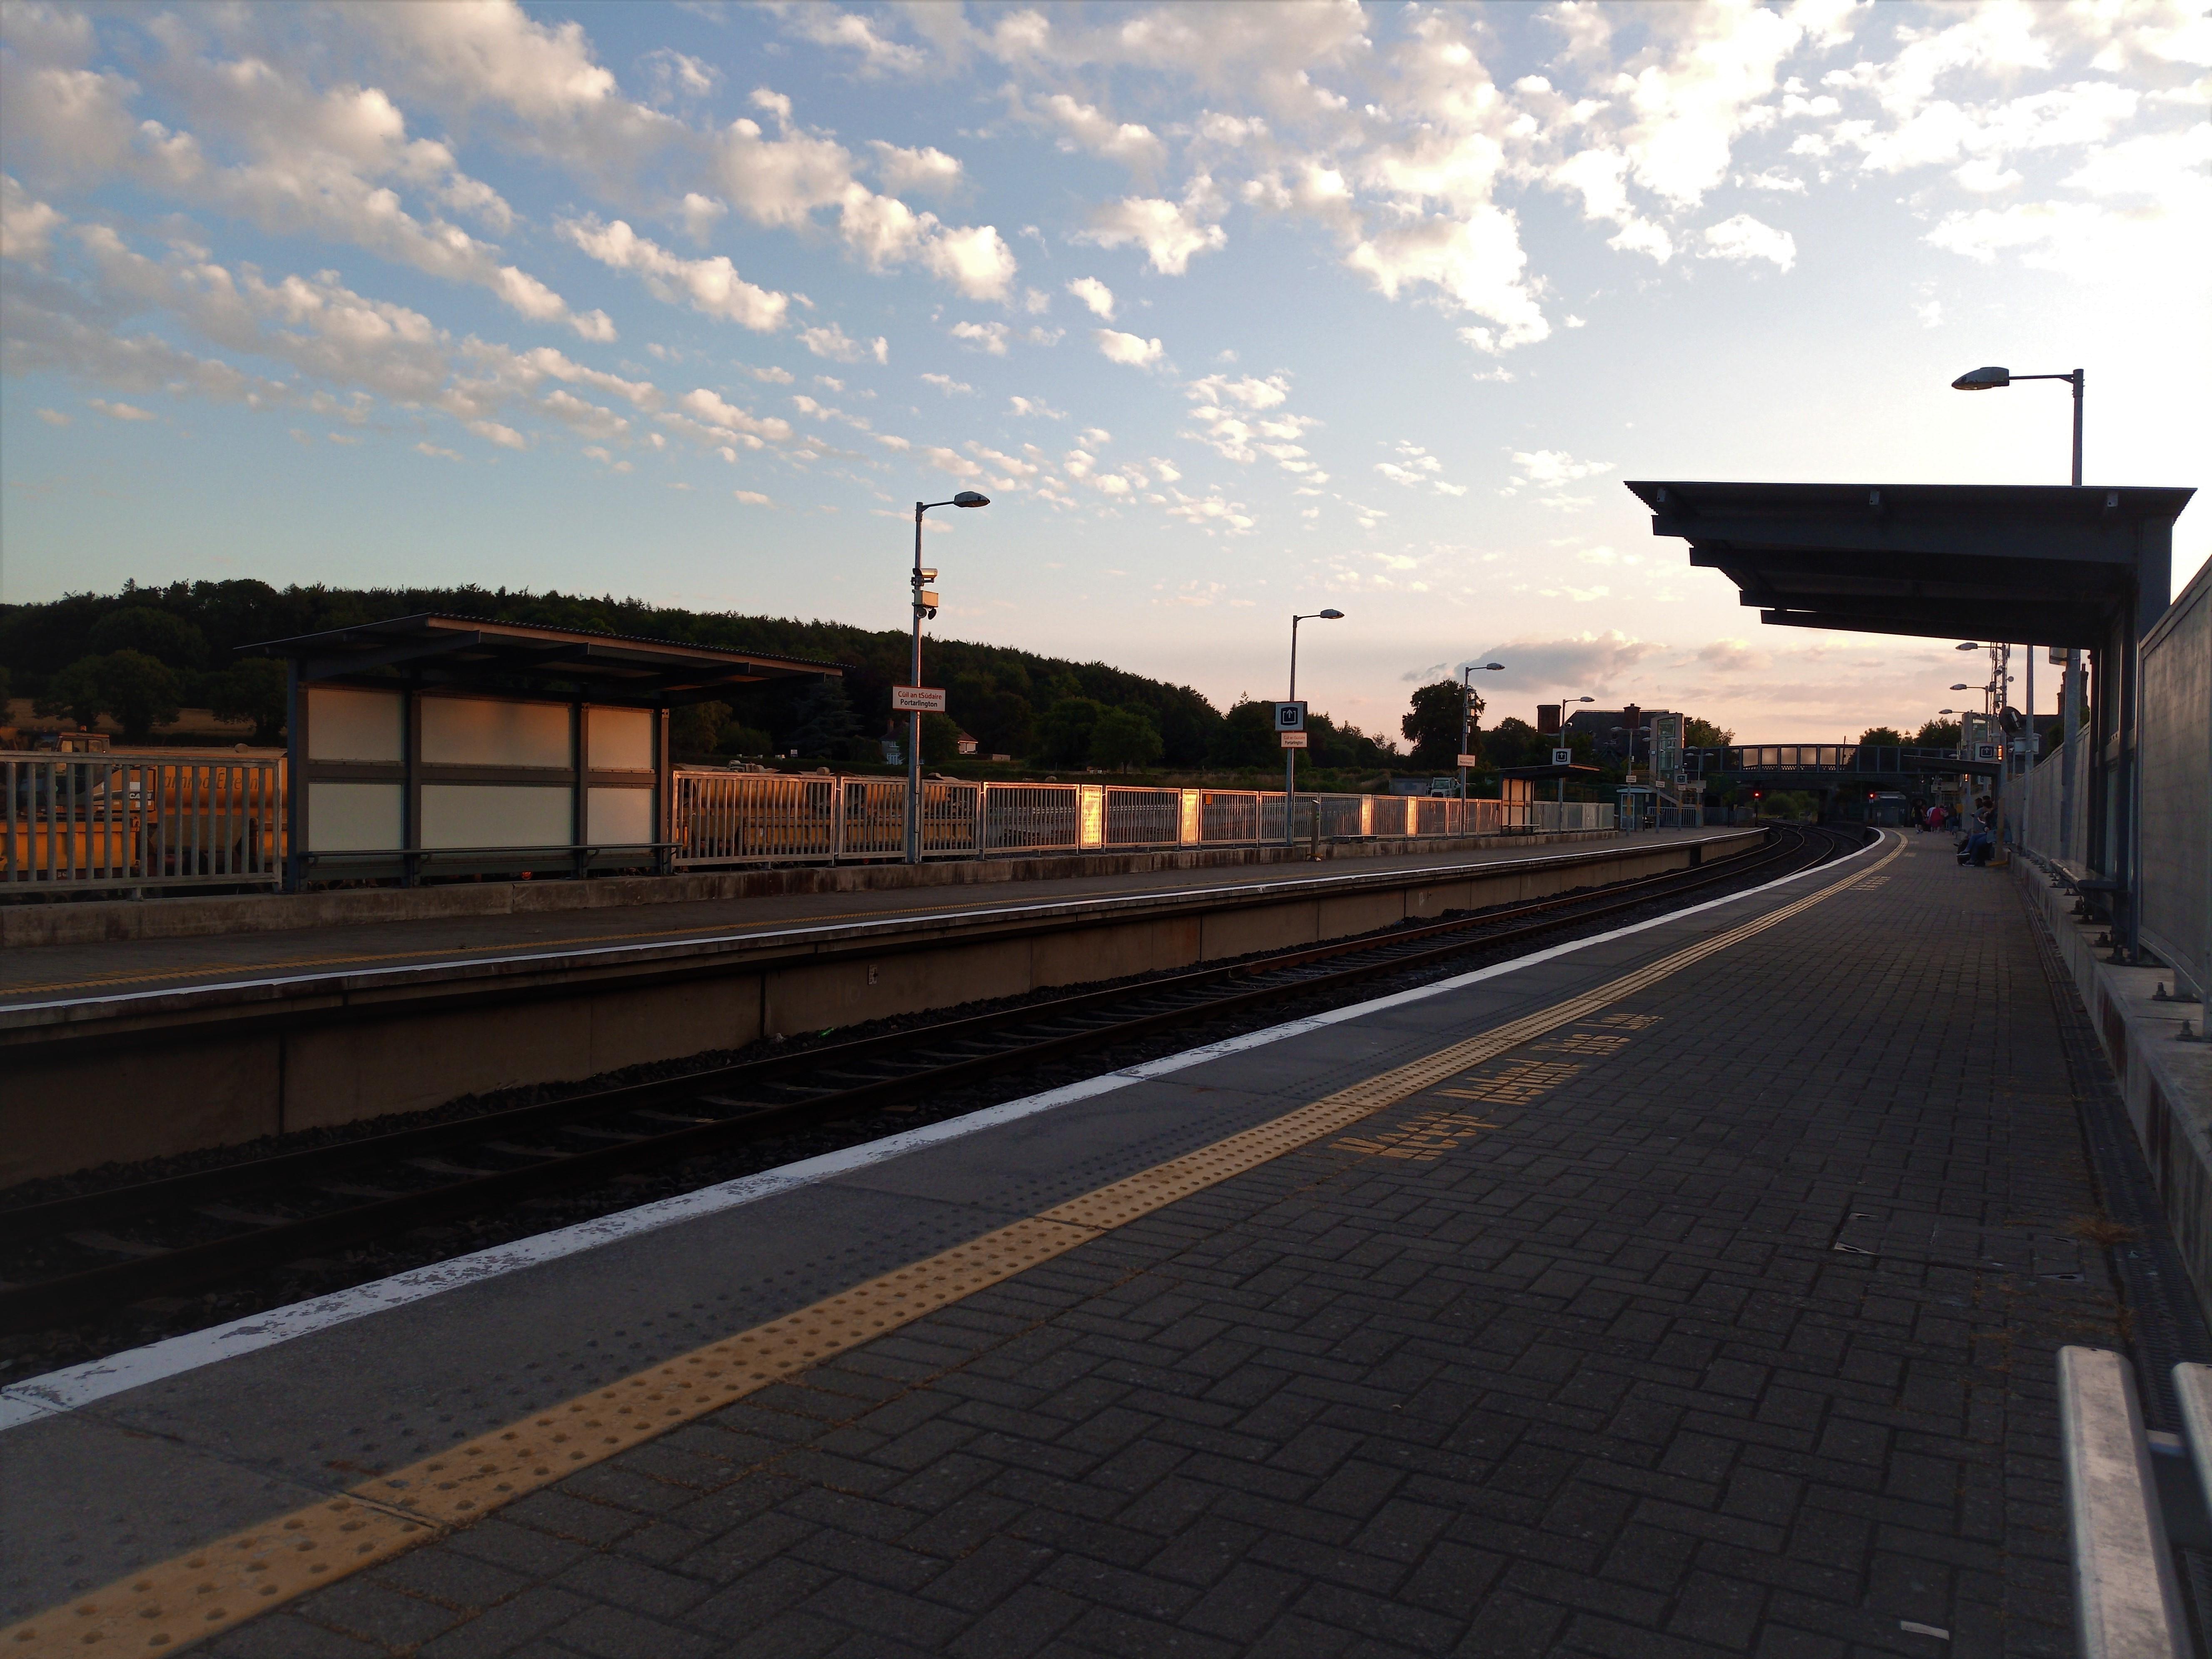 Waiting the train